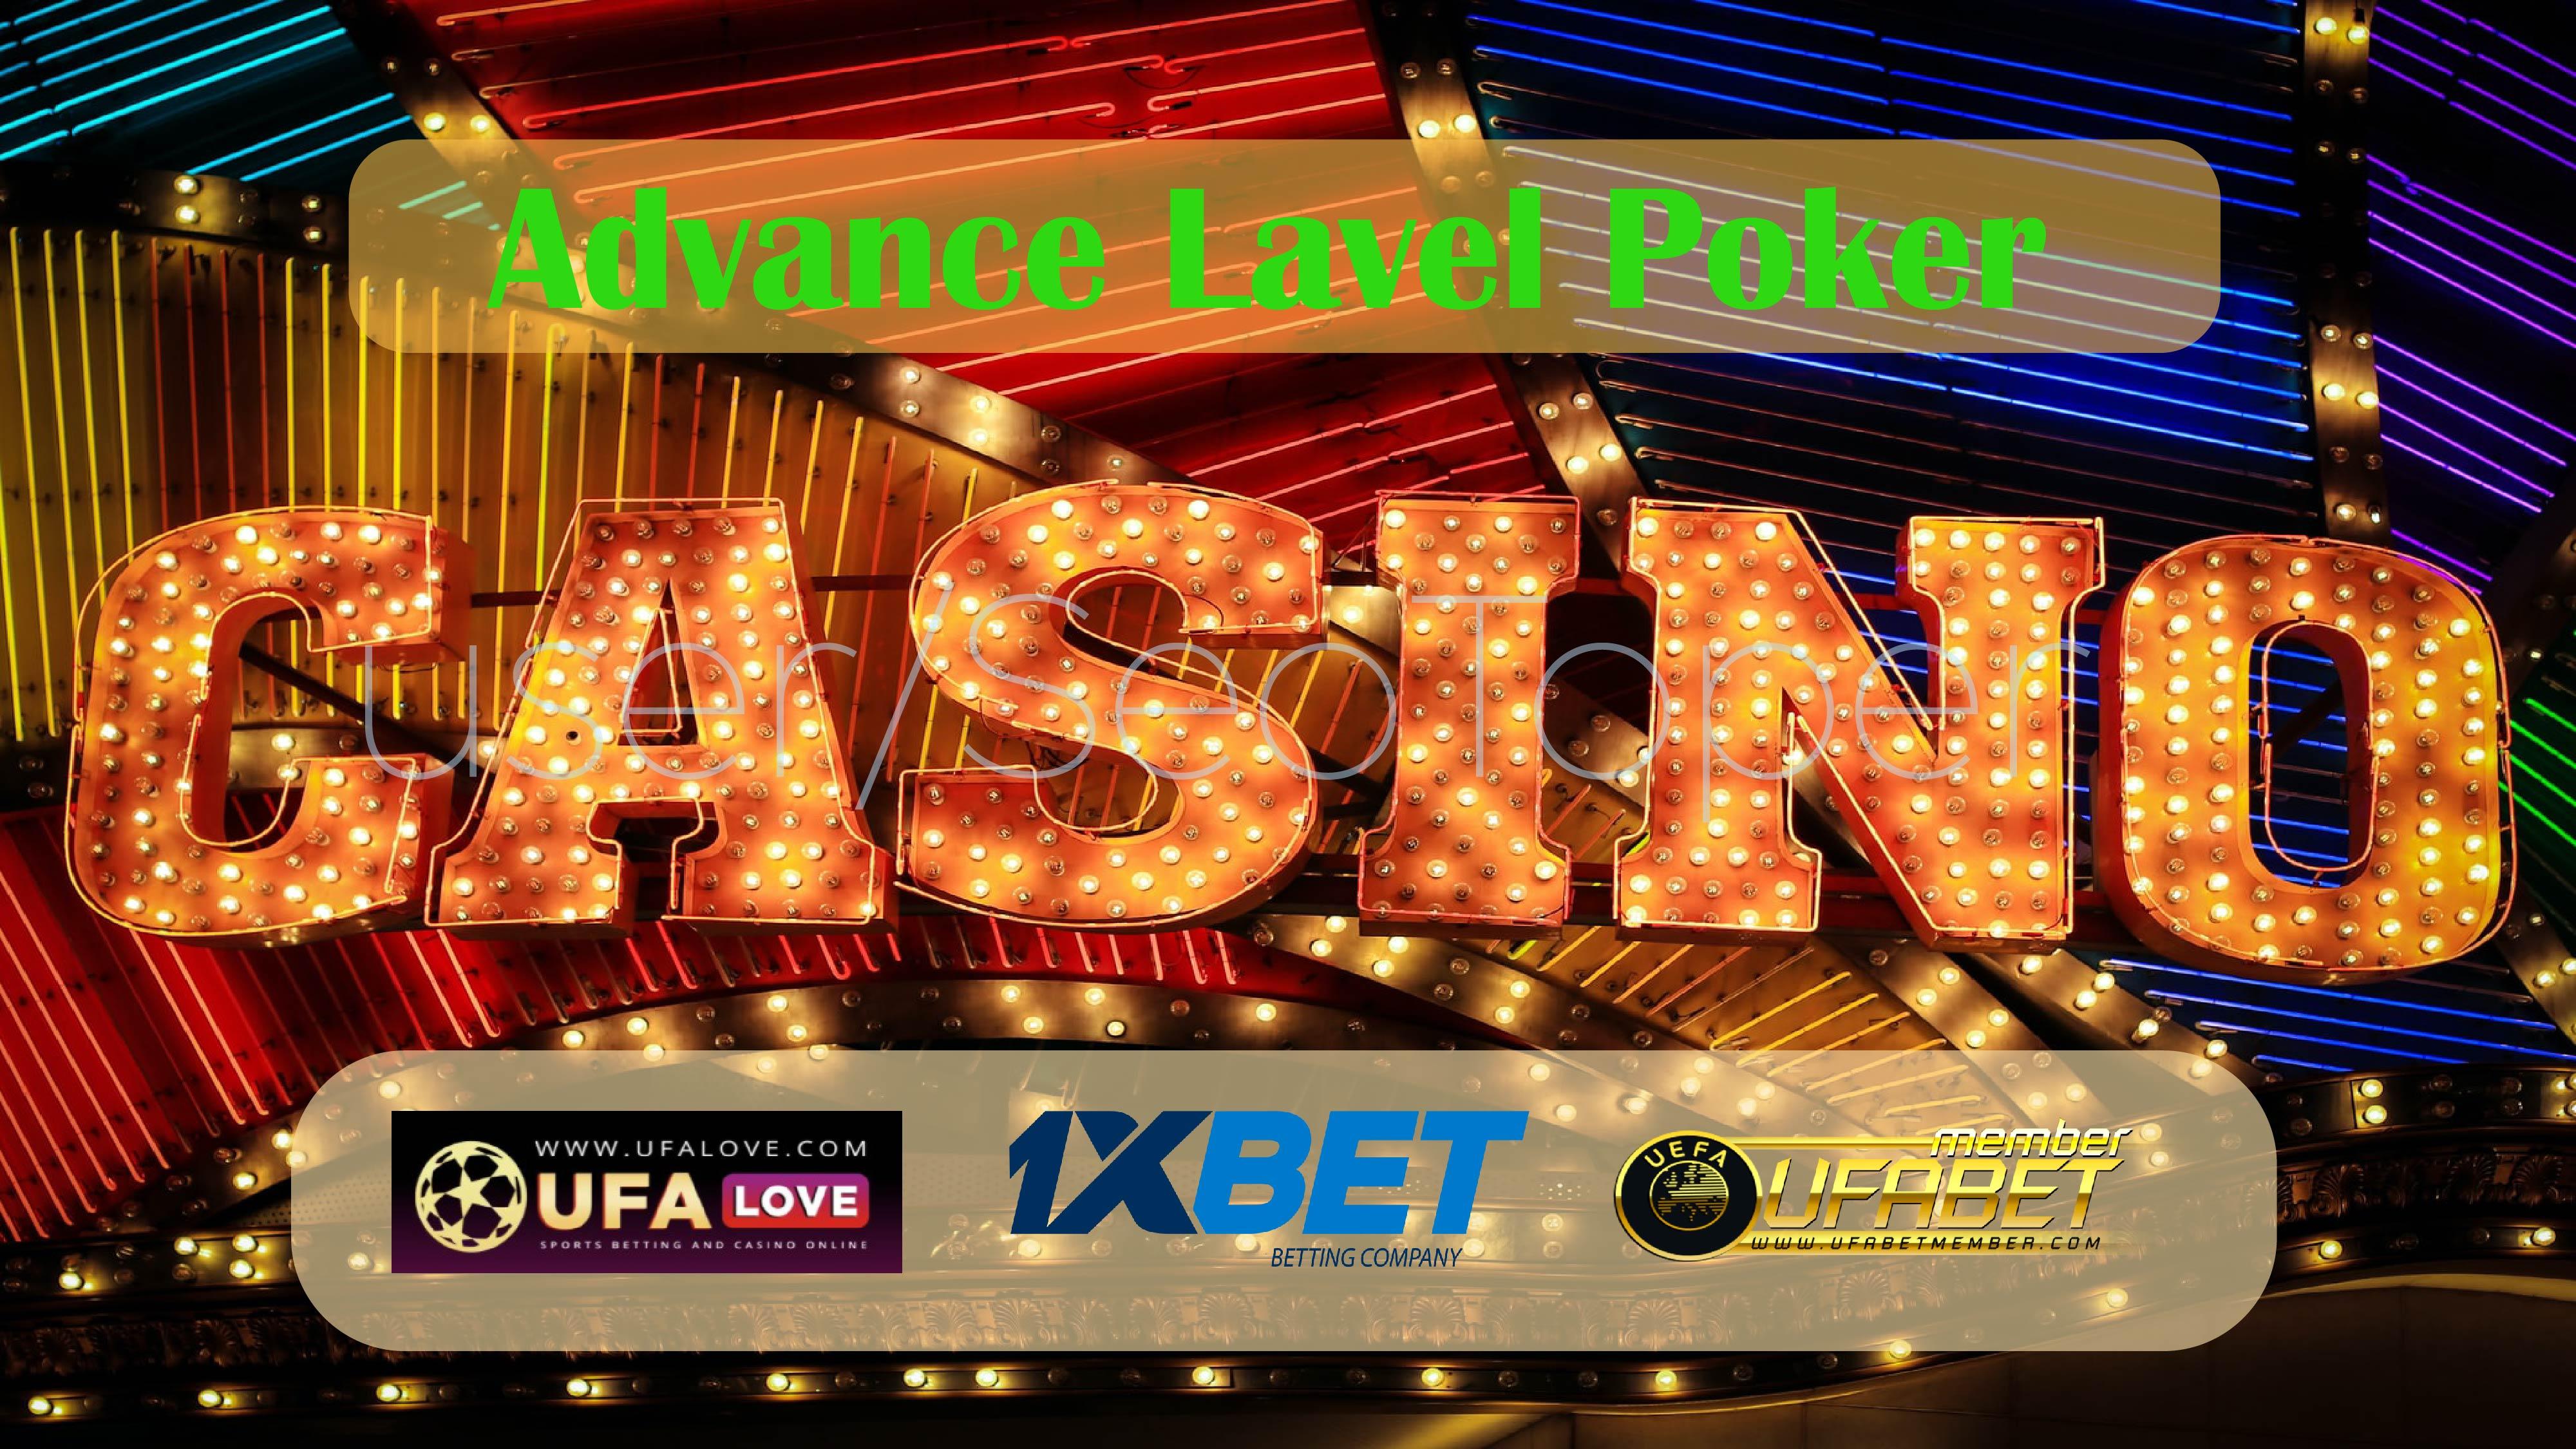 Build Monthly Casino Judi Poker Gambling UFA BET Sites Guaranteed Google 1st Page On Gllgle